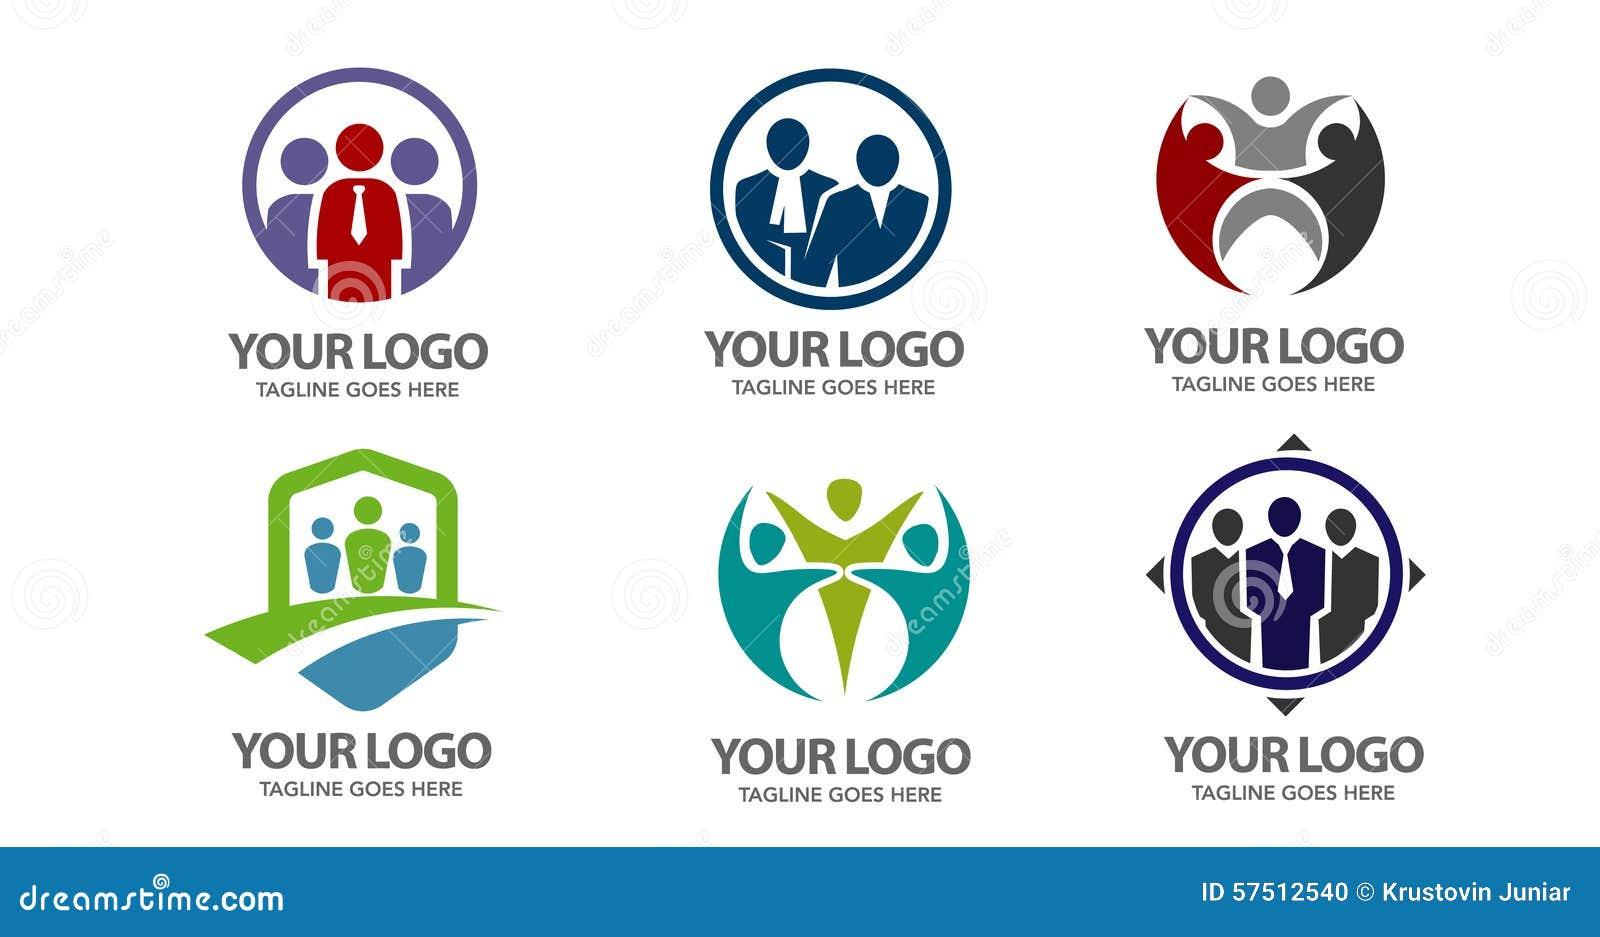 People vector logo stock vector. Image of blue, head - 57512540